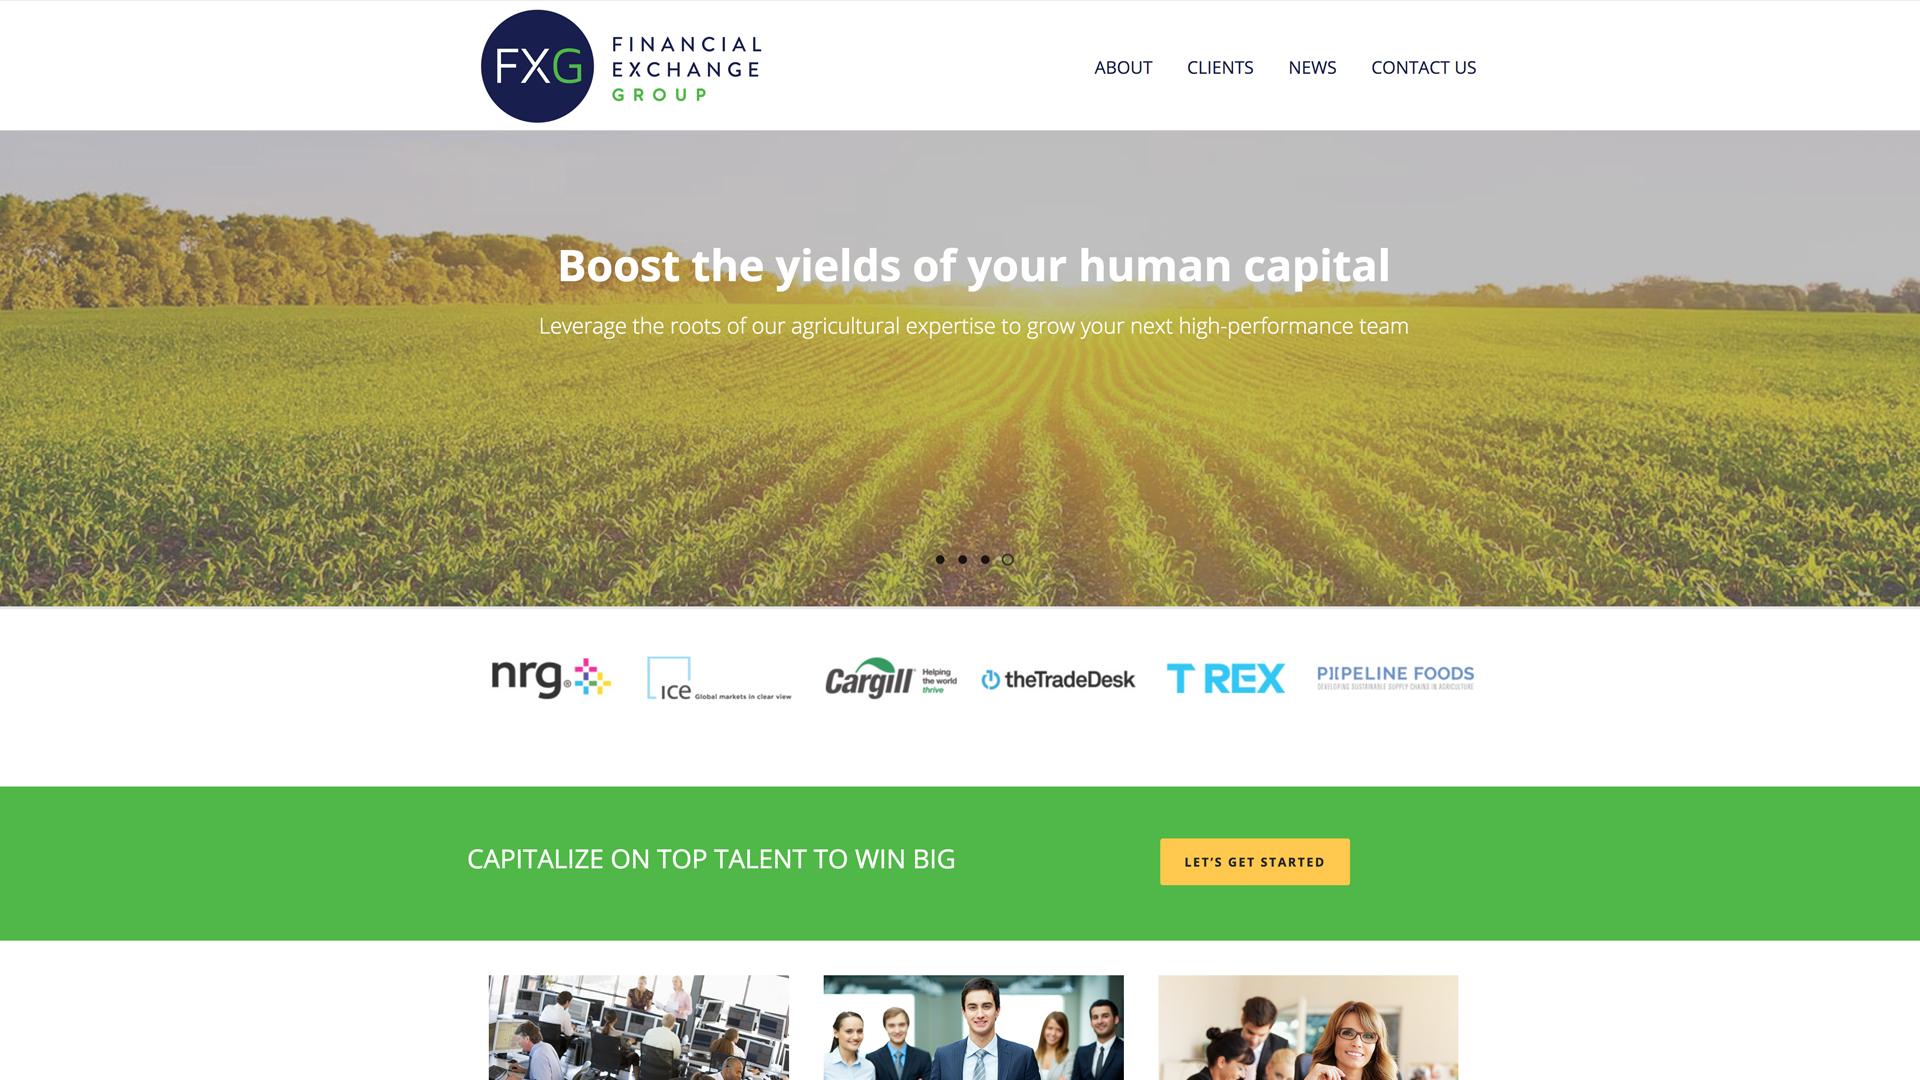 Recent Work: Financial Exchange Group